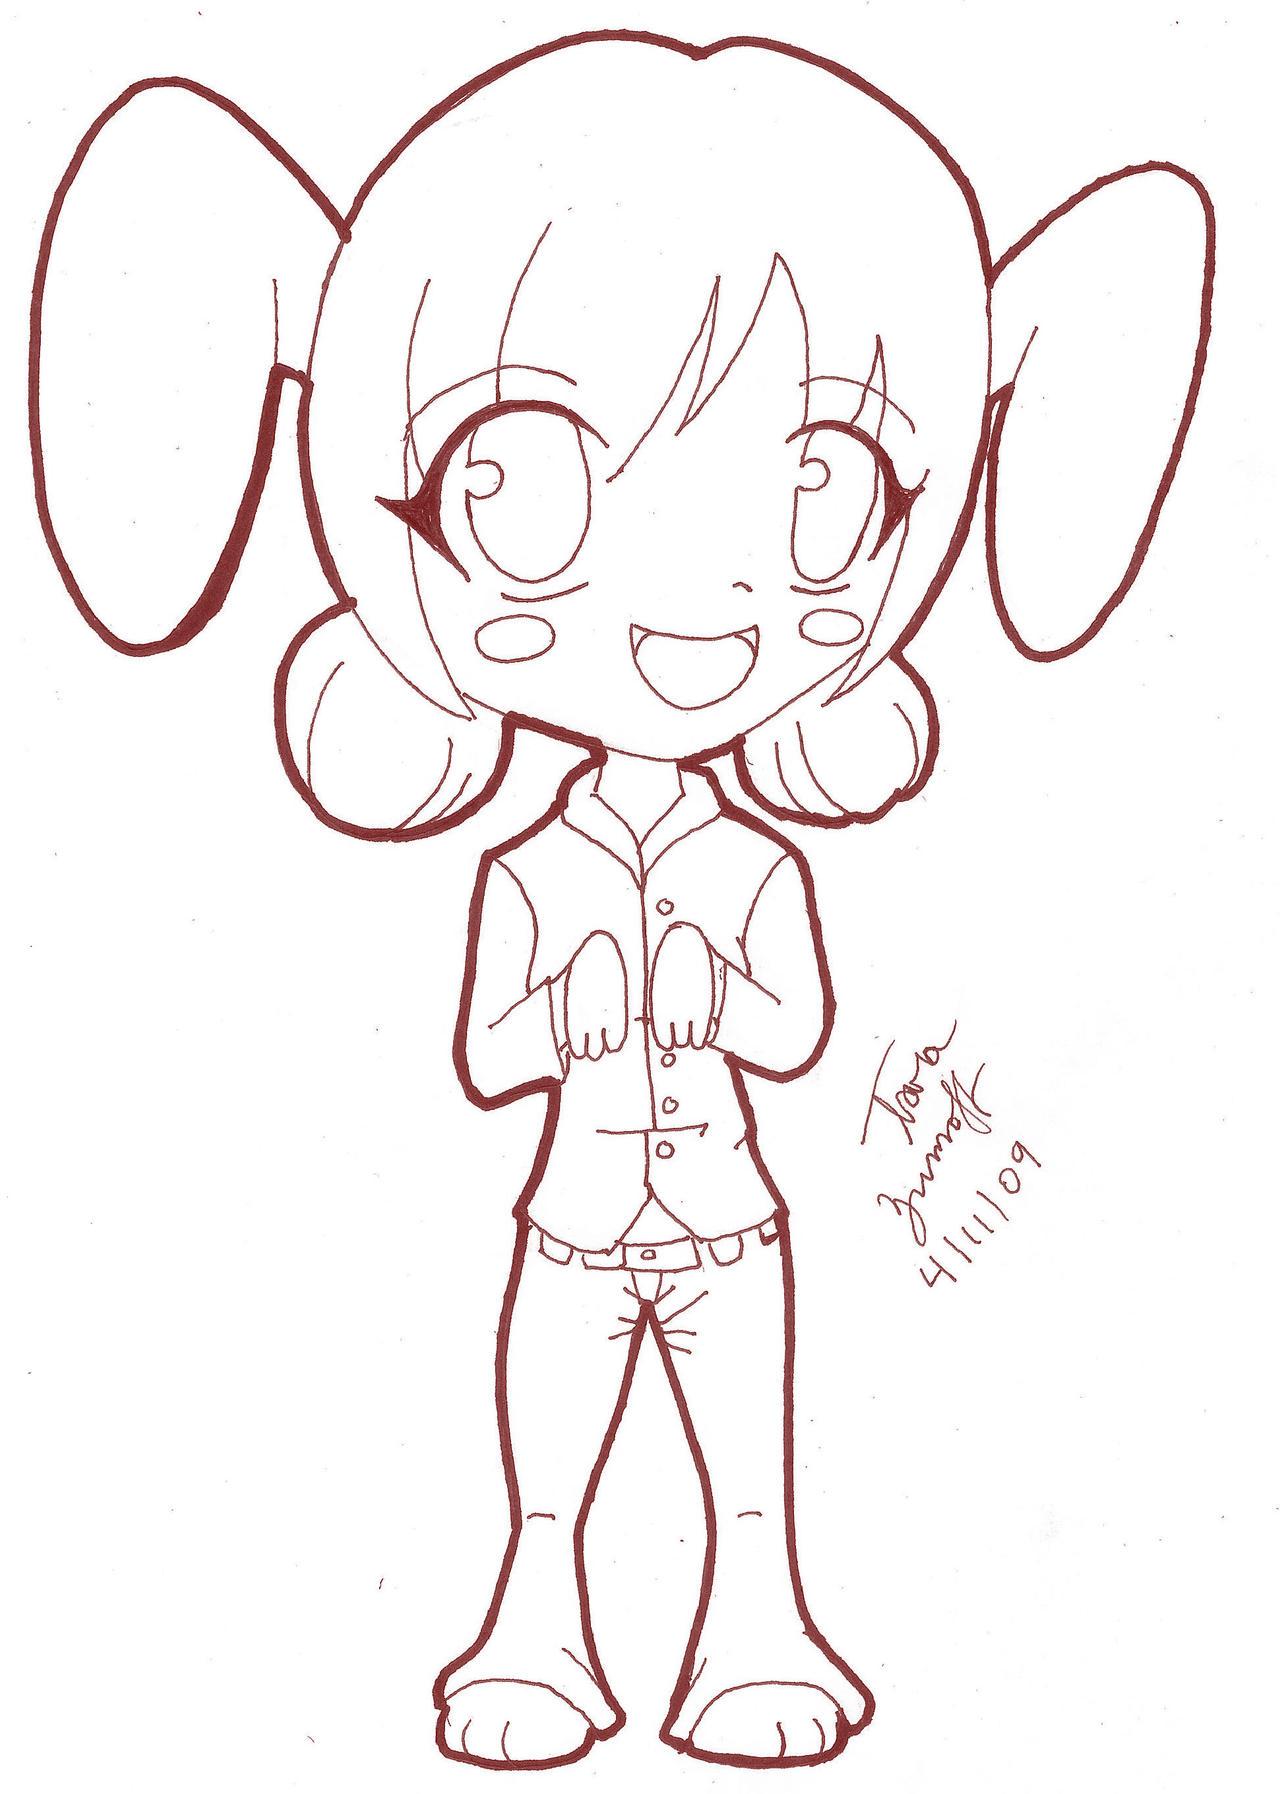 Zodiac Line Drawing : Chinese zodiac rabbit line art by tblondie on deviantart